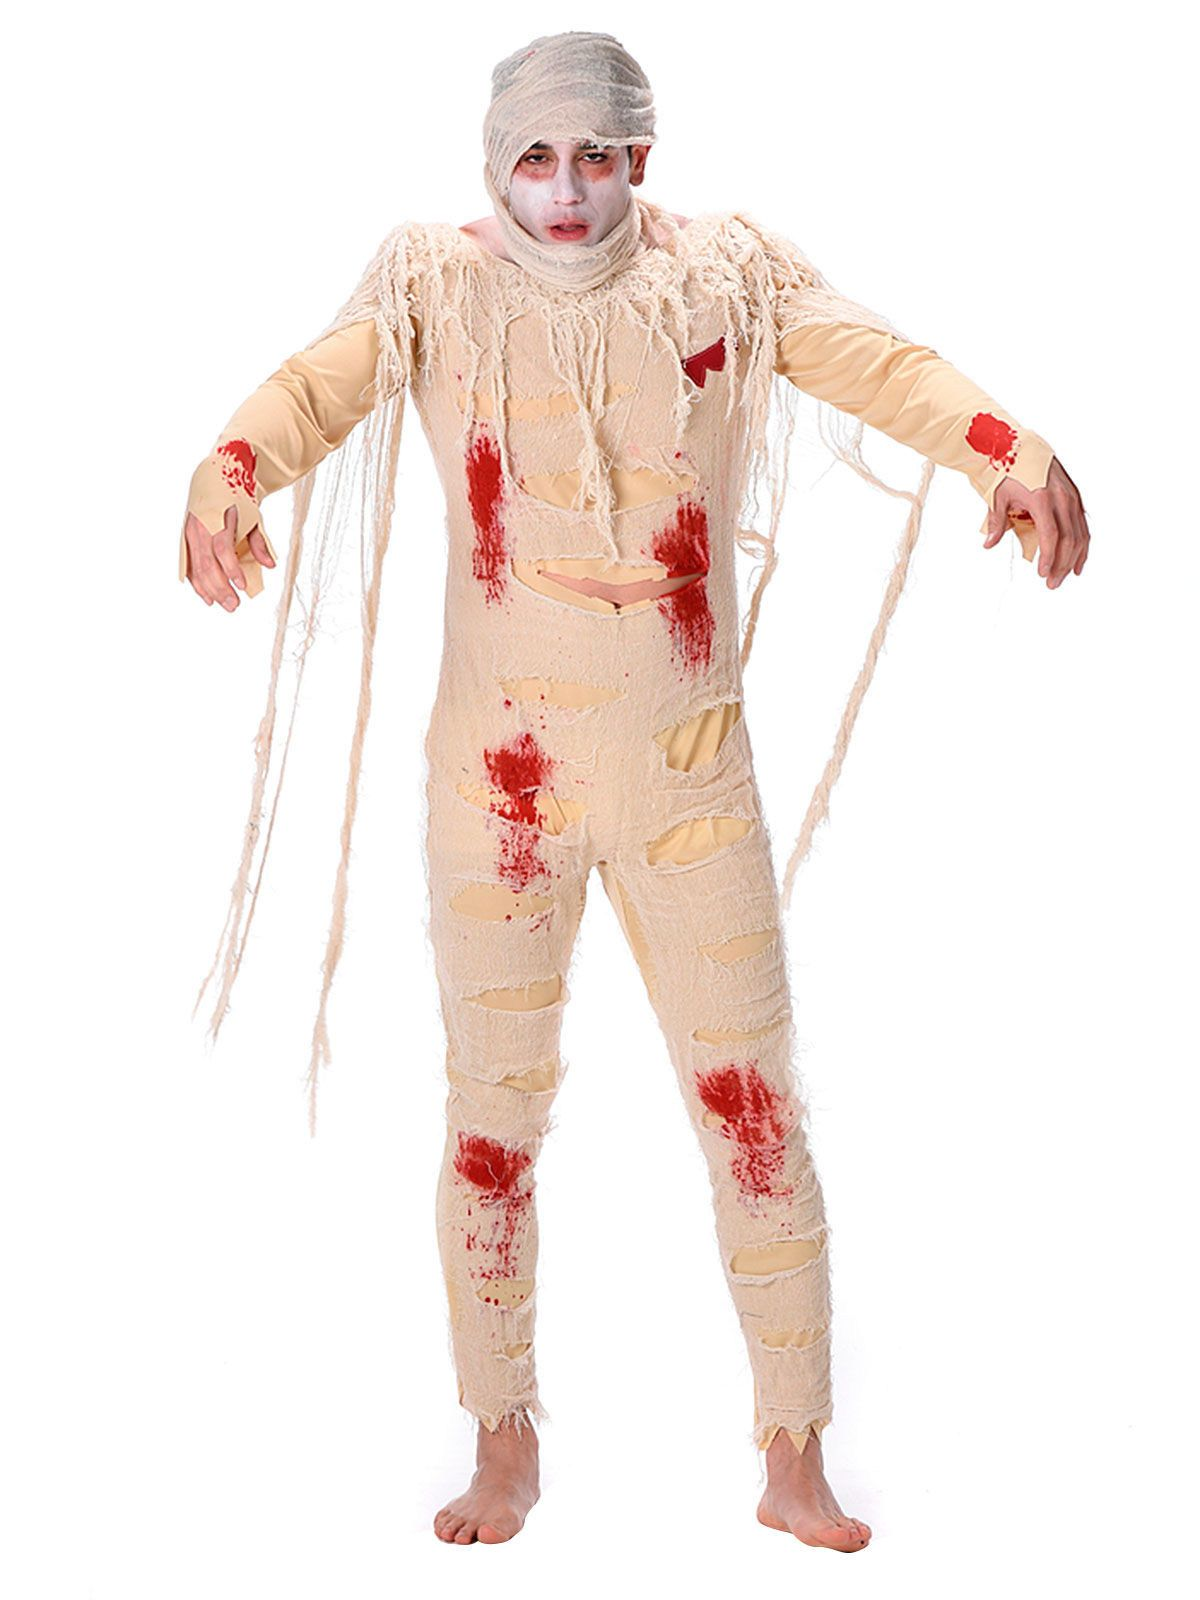 「blutige mumie」の画像検索結果